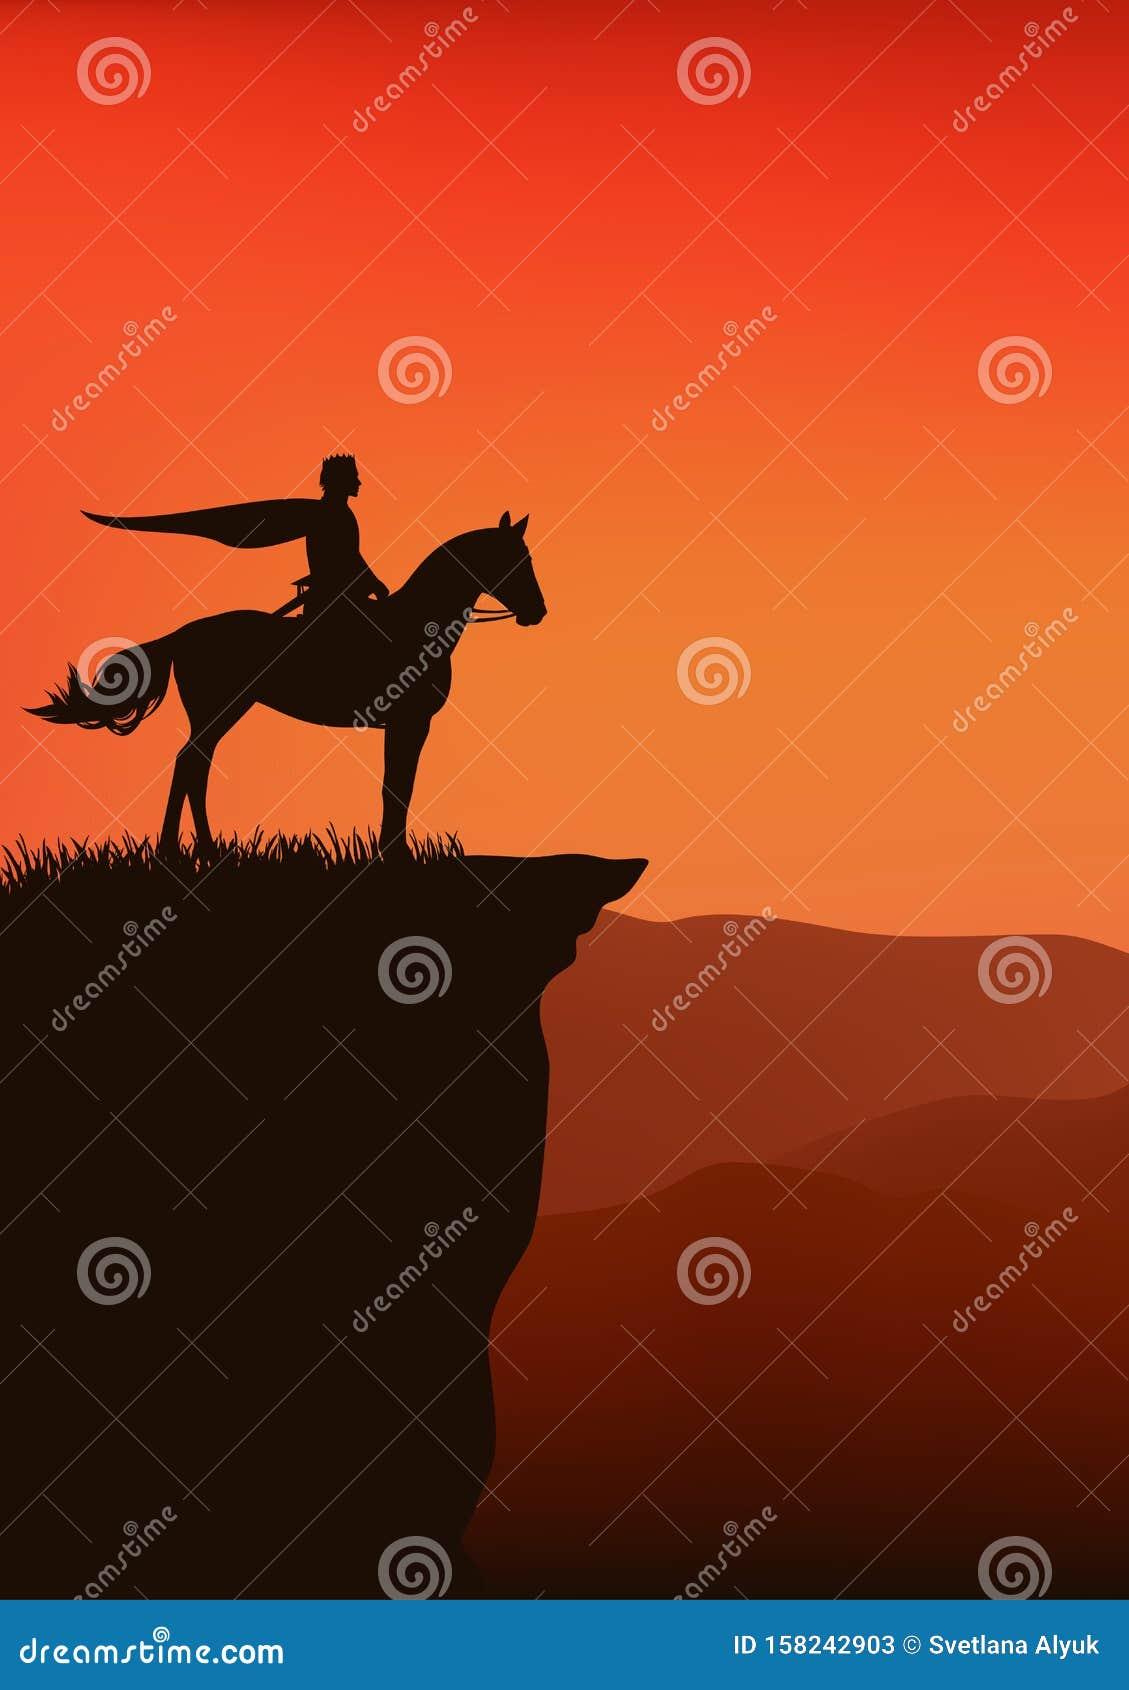 Horse Rider Cliff Stock Illustrations 35 Horse Rider Cliff Stock Illustrations Vectors Clipart Dreamstime